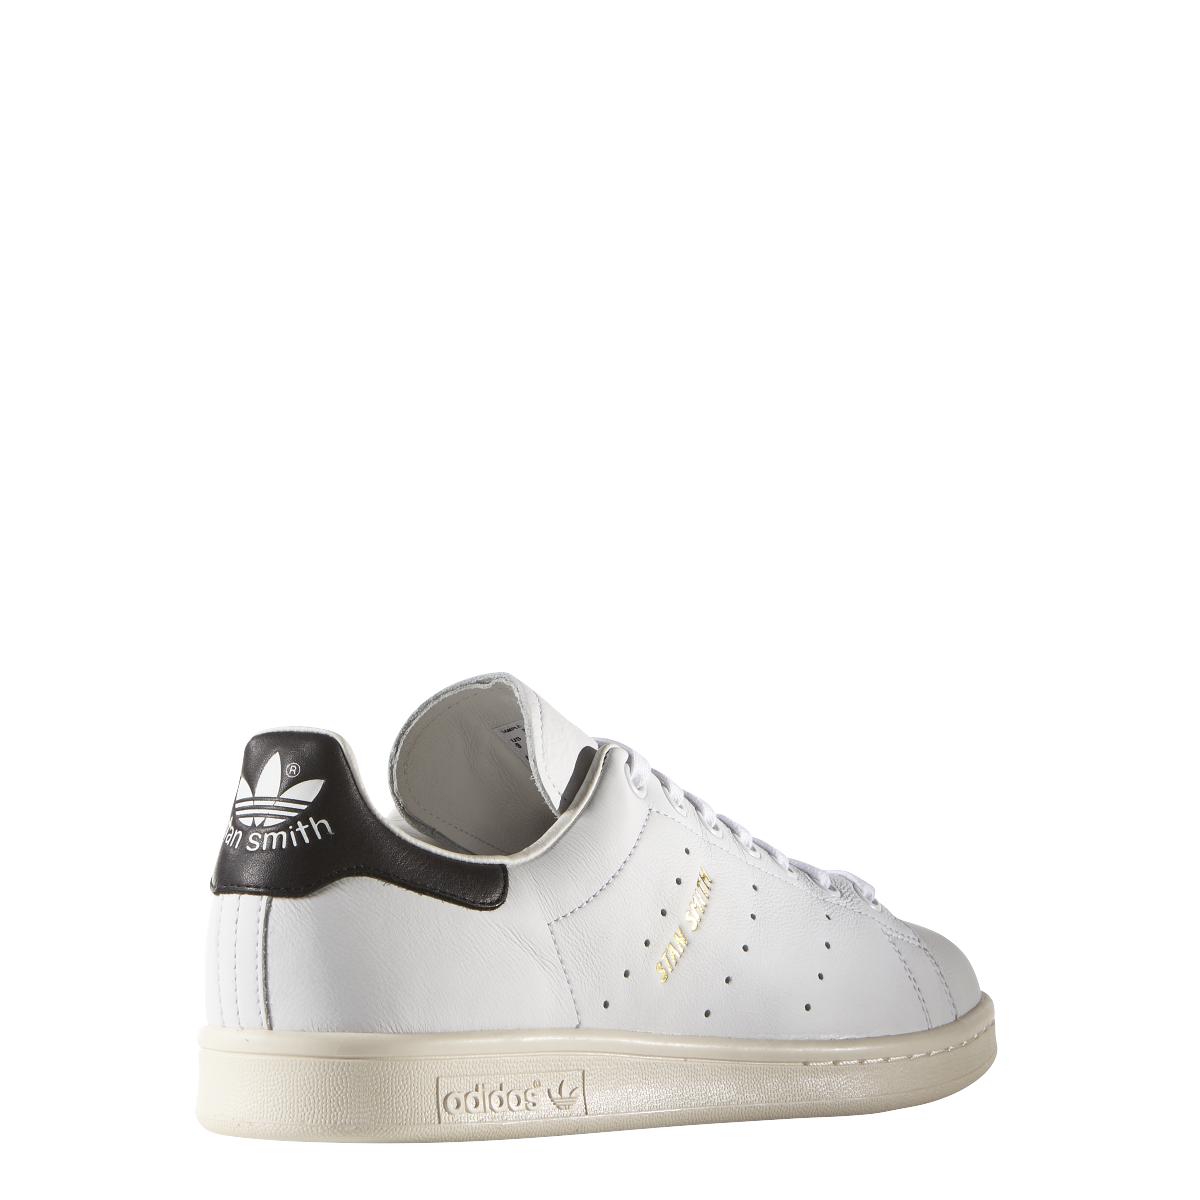 sport klingenmaier adidas originals stan smith sneaker. Black Bedroom Furniture Sets. Home Design Ideas